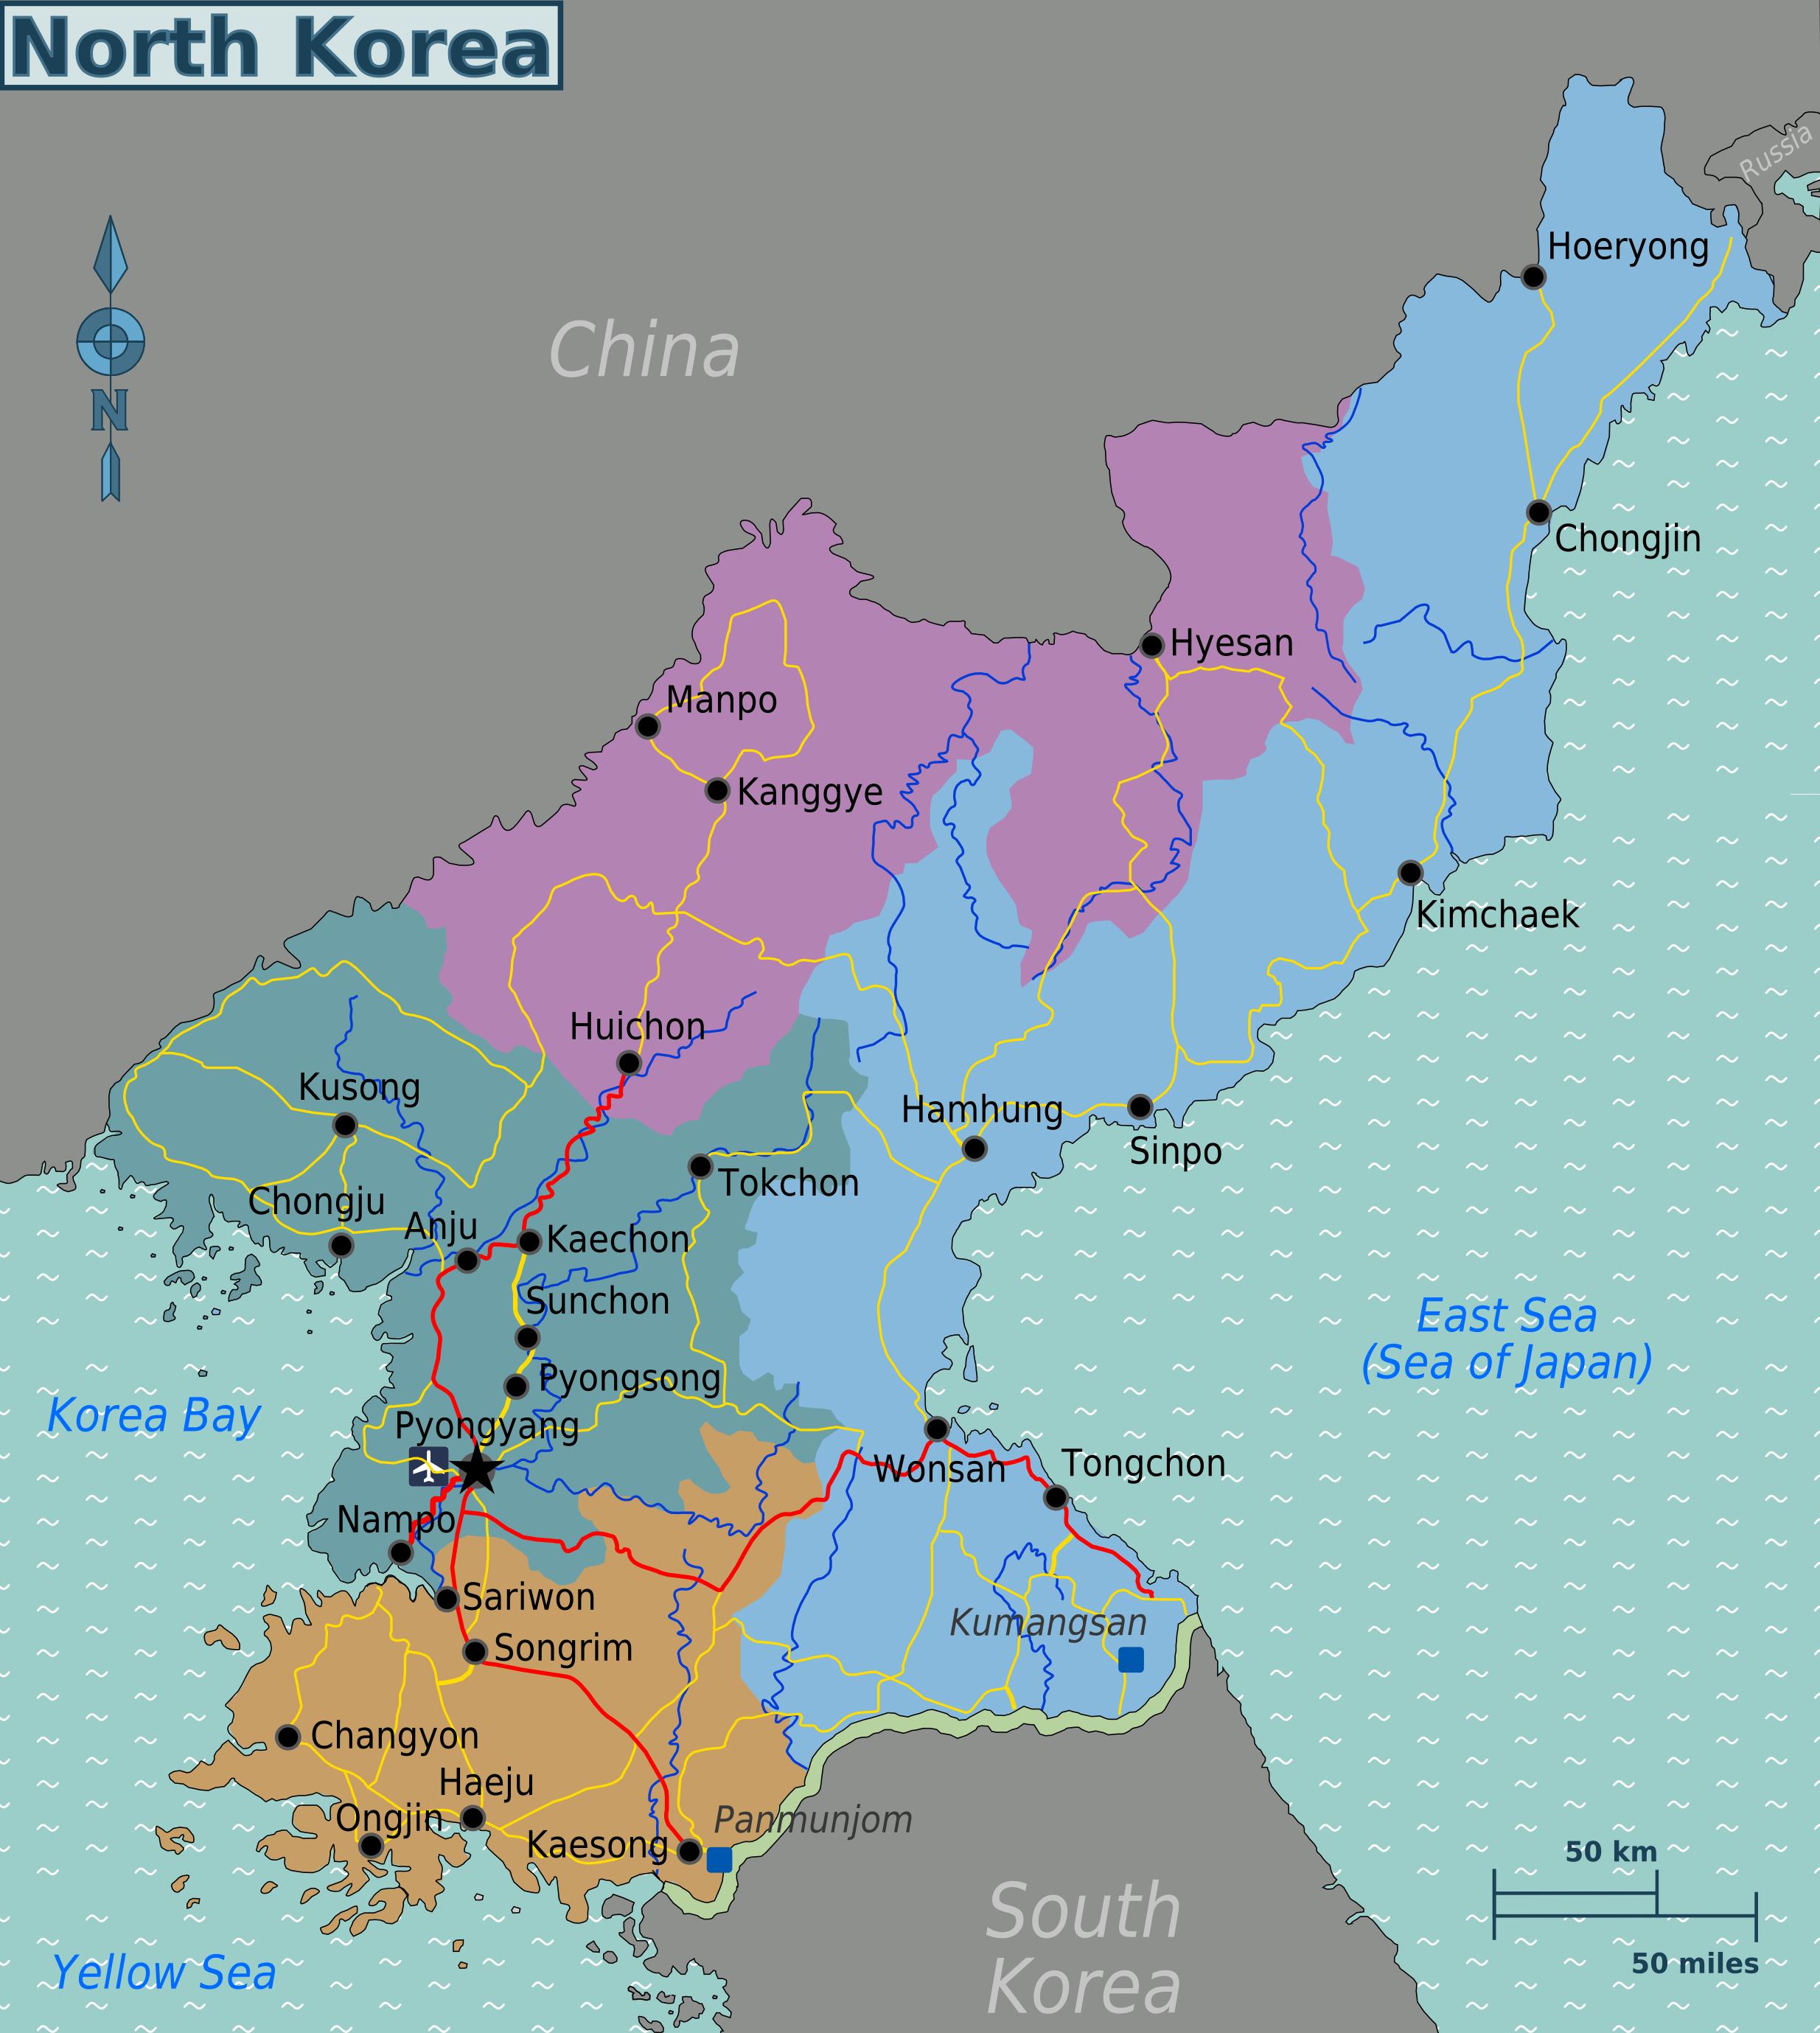 weltkarte korea Map of North Korea (Map Regions) : Weltkarte.  Karten und  weltkarte korea